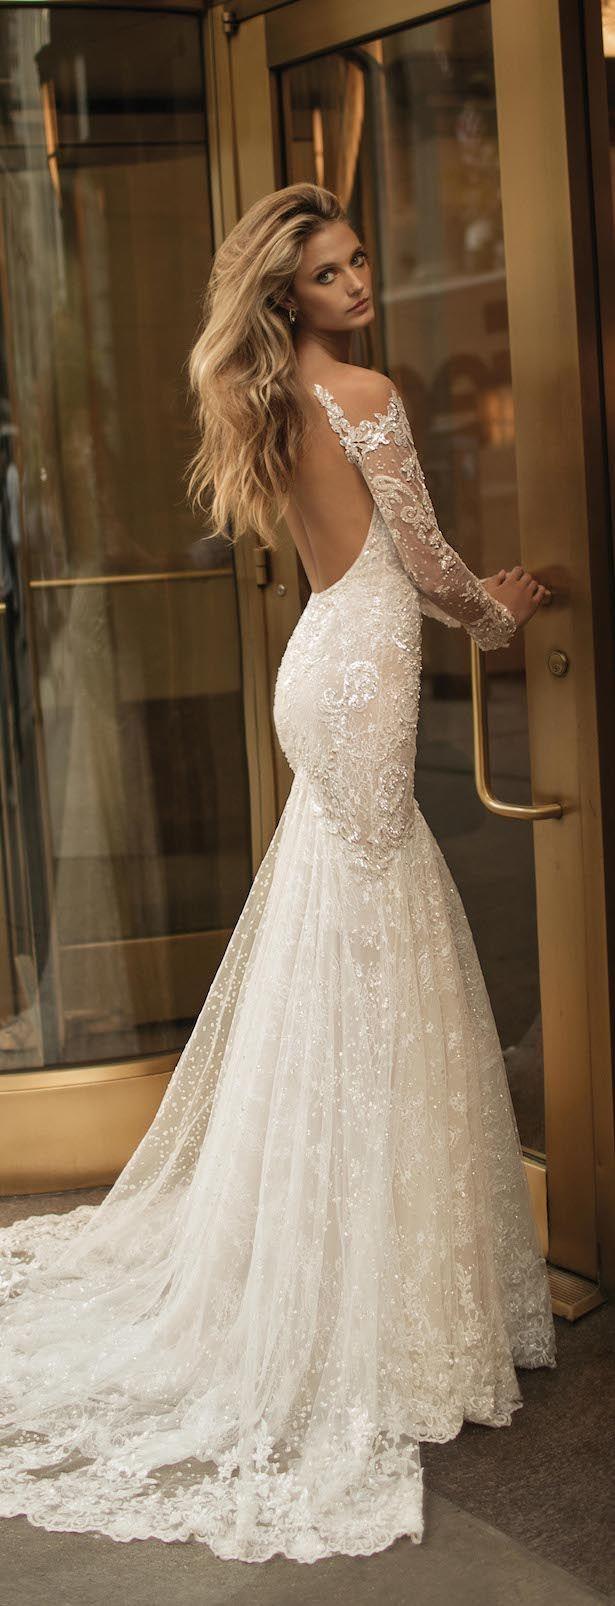 Nice dresses for wedding  nice dress  Dress Patterns  Pinterest  Nice dresses Wedding